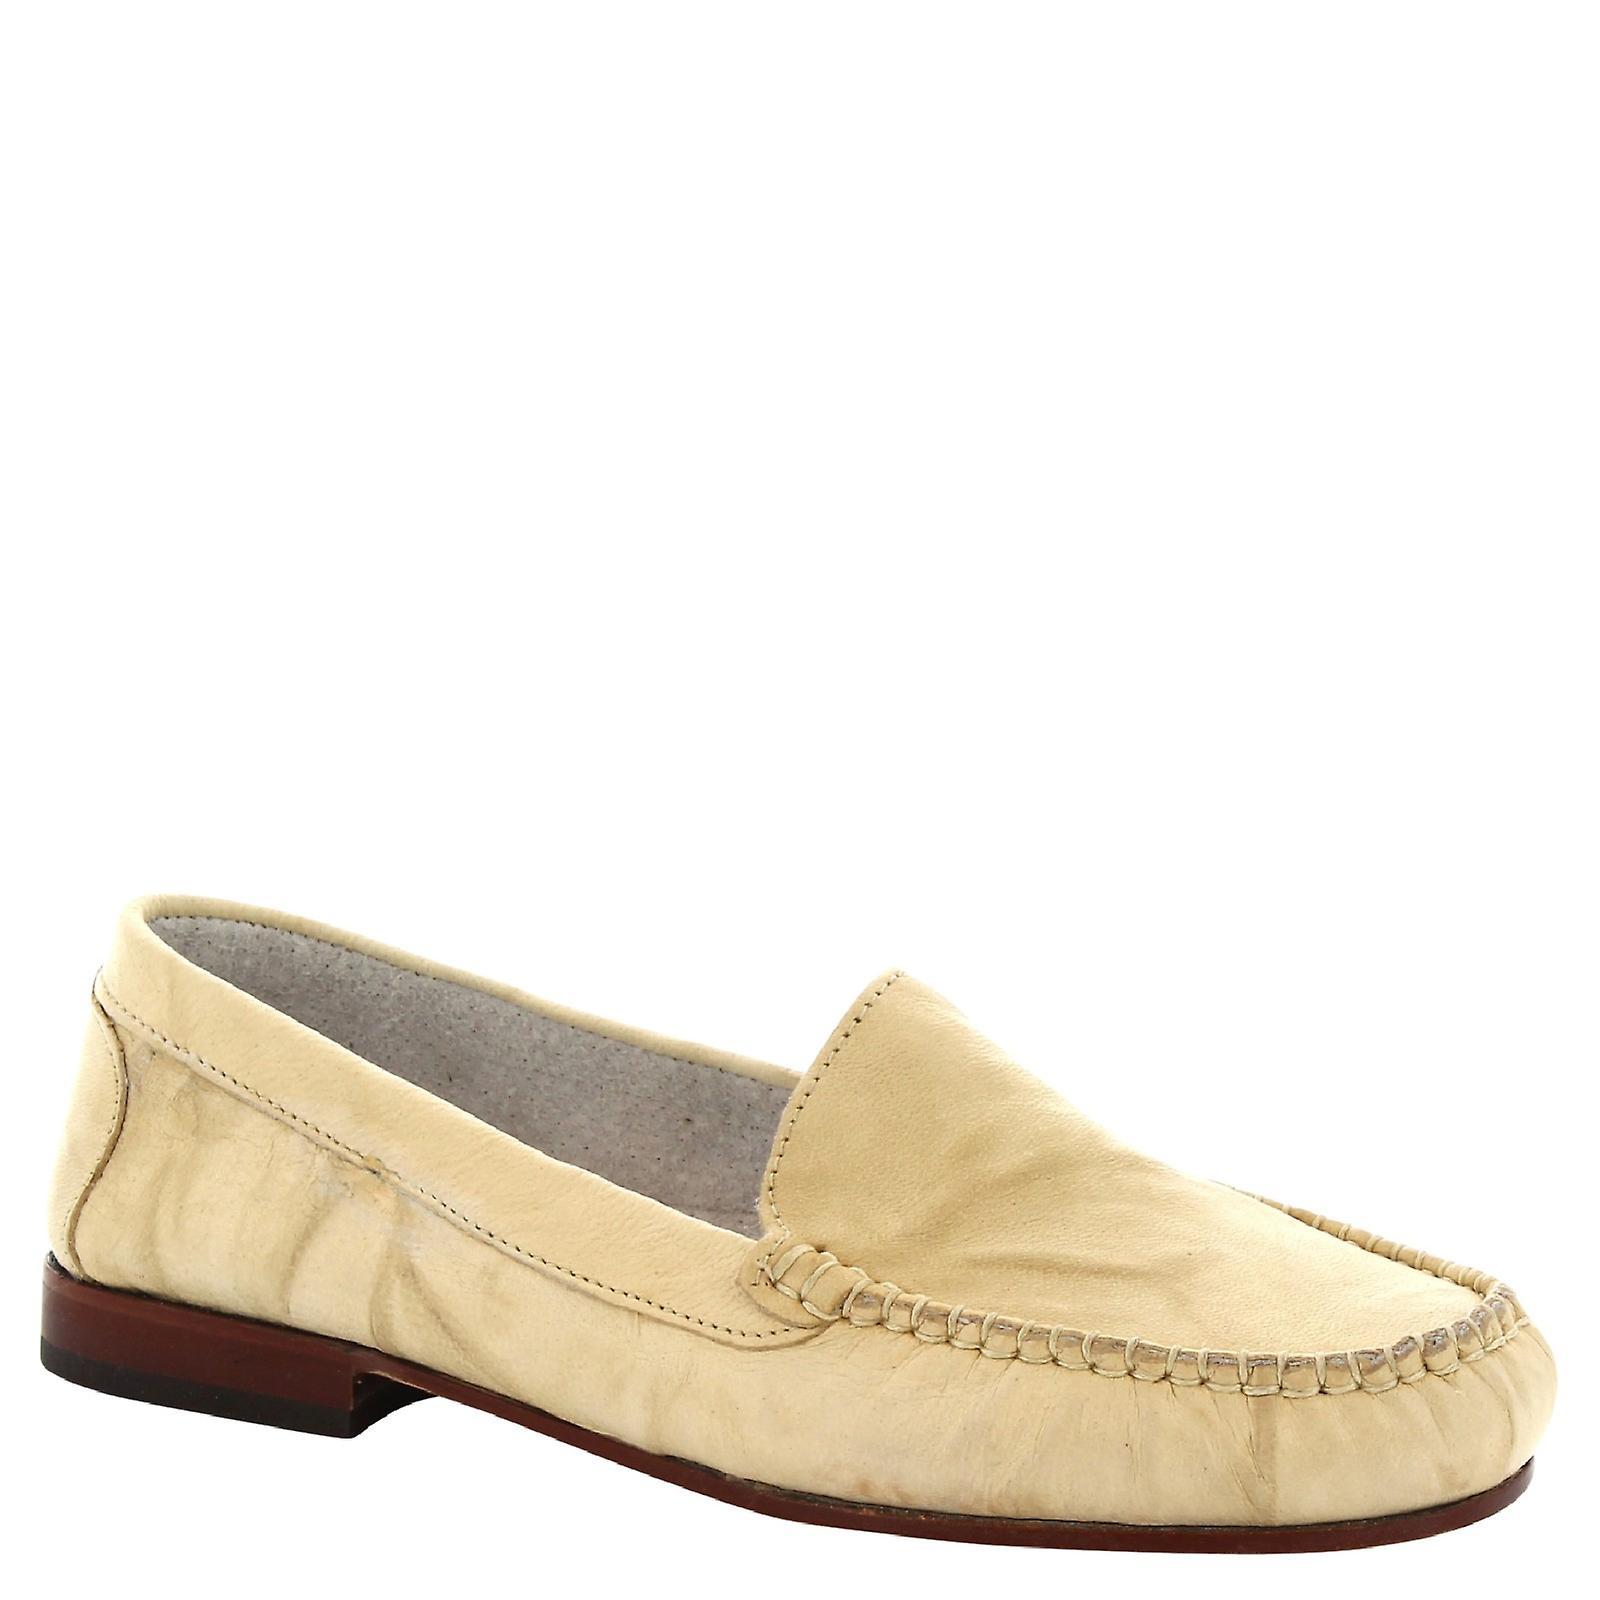 Leonardo Shoes Women's handmade slip-on loafers in cream calf leather Zuamg